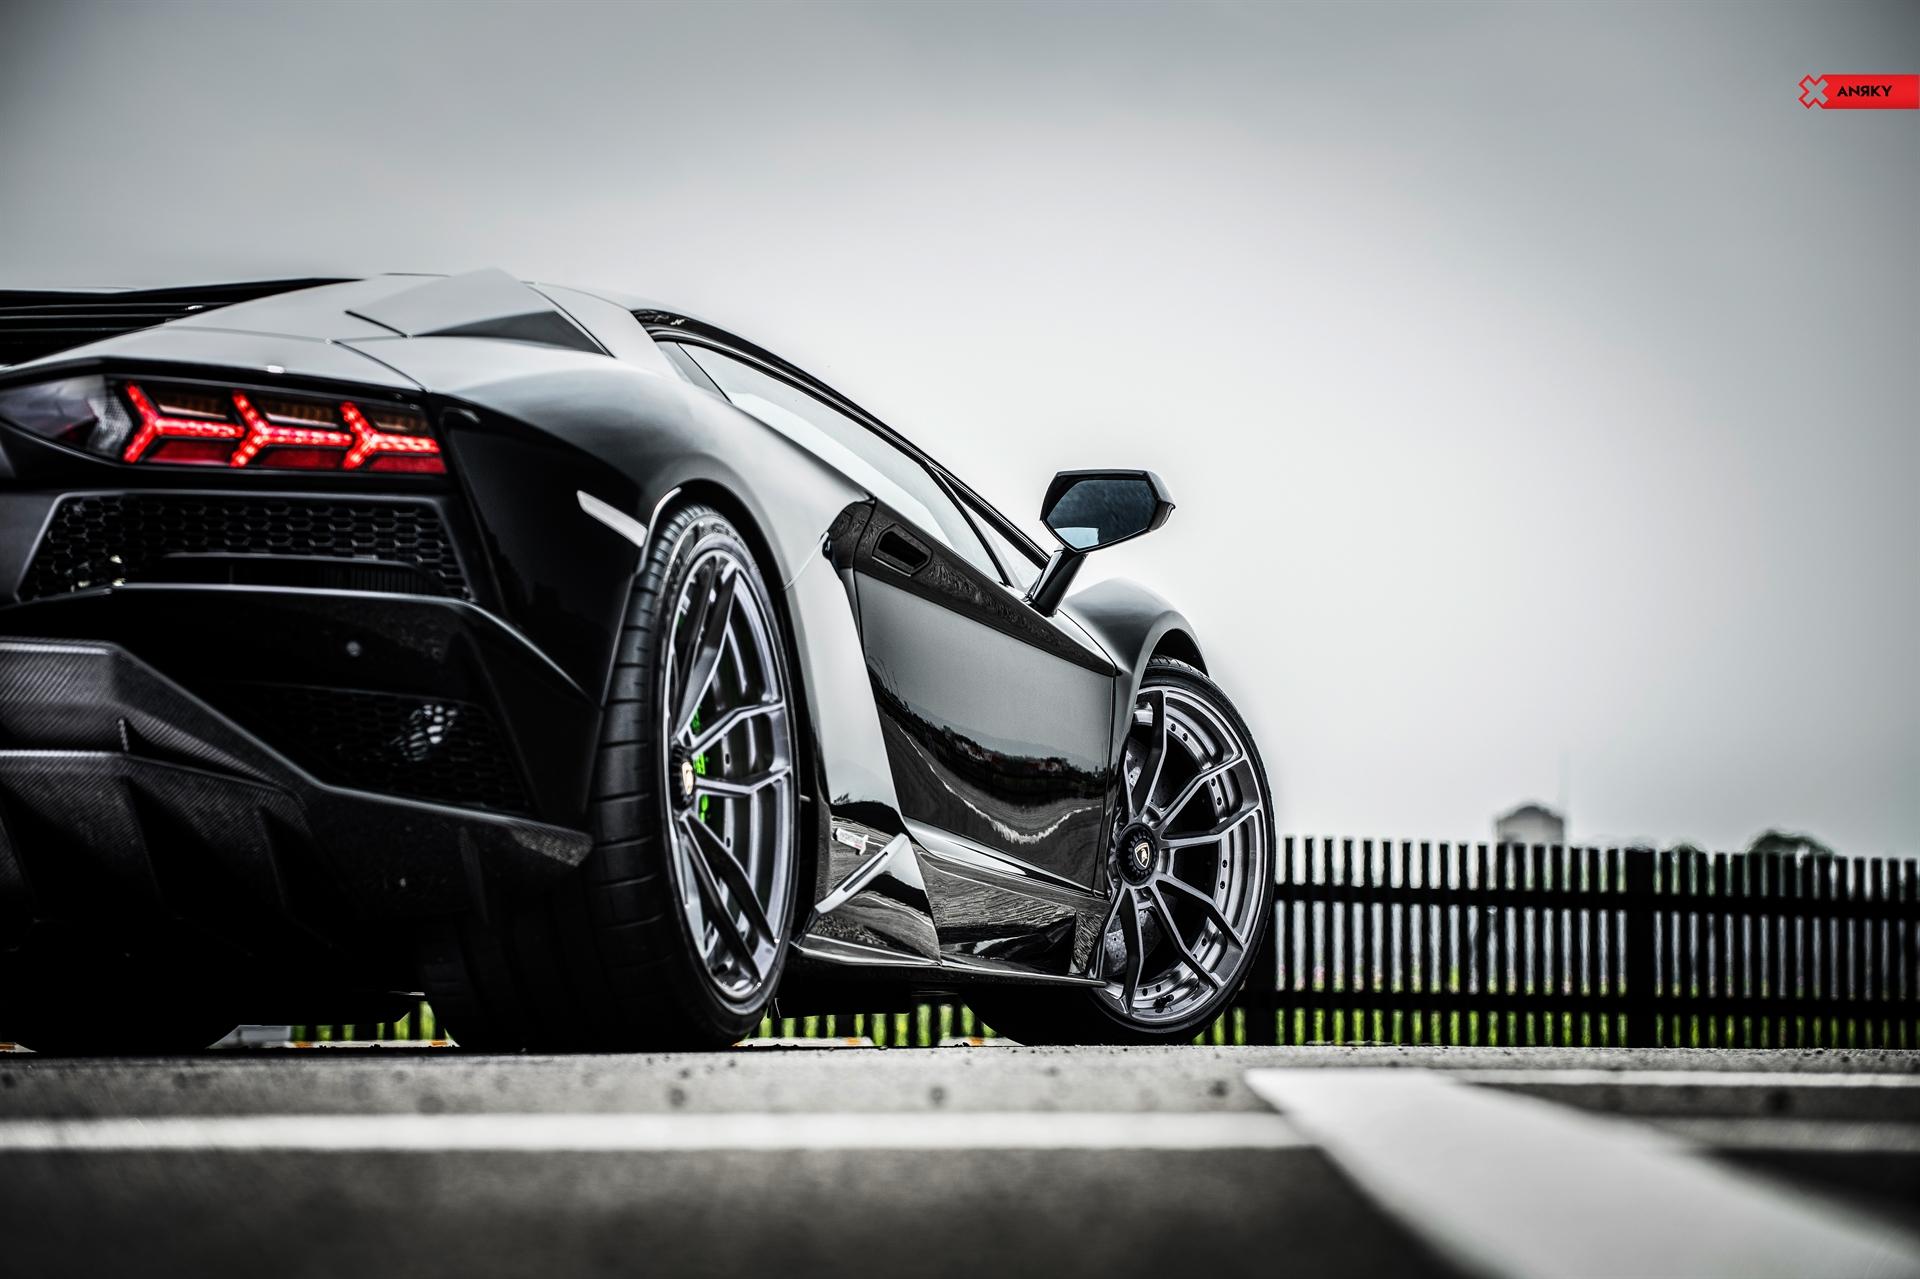 Lamborghini Aventador S – AN21 SeriesTWO